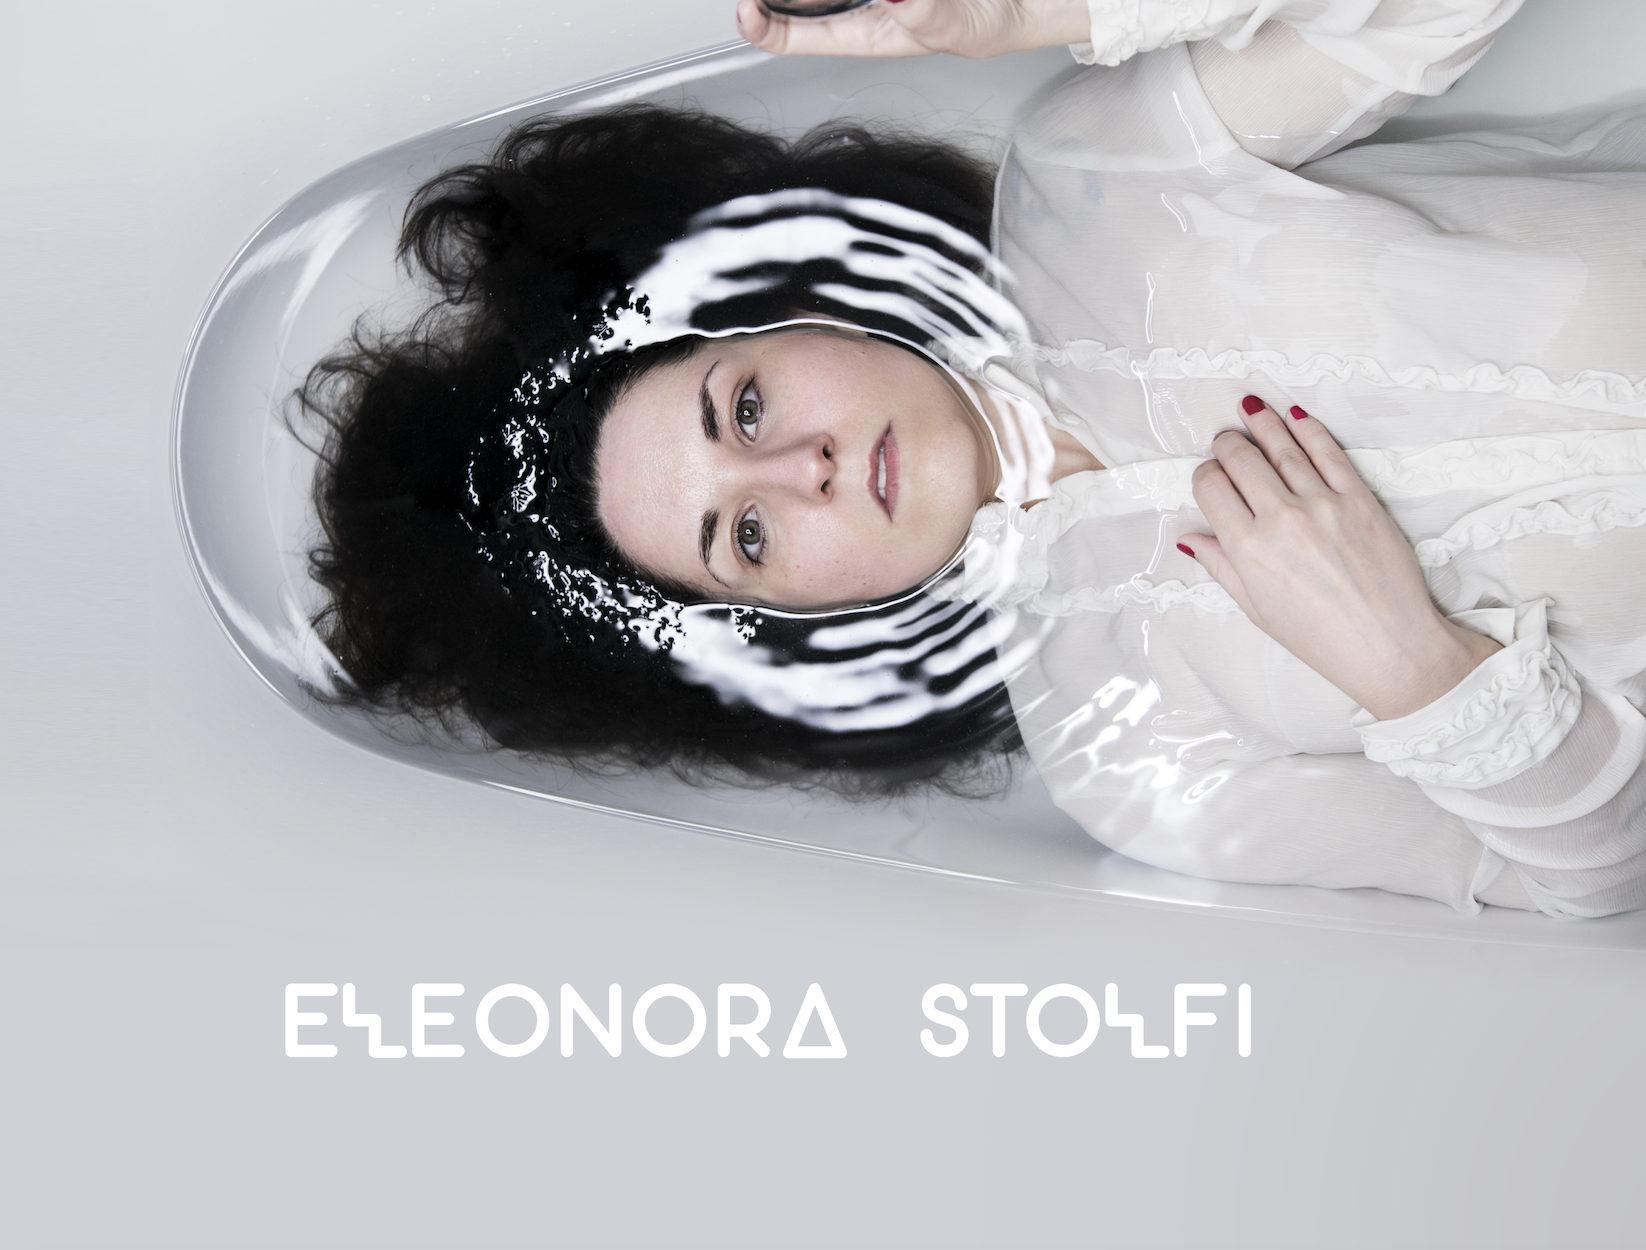 Eleonora Stolfi – Acoustic show Thumbnail